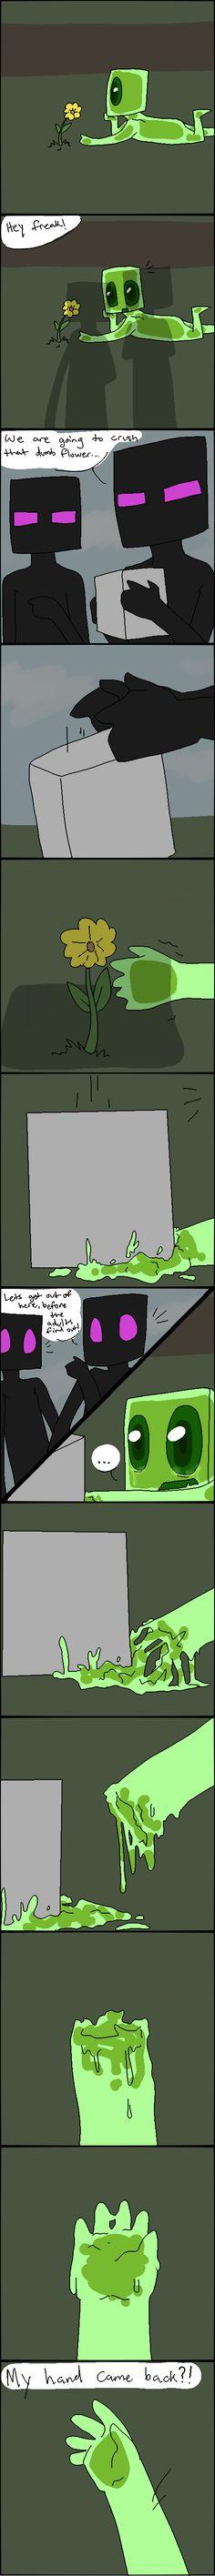 Little Enderslime - Comic by AccursedAsche.deviantart.com on @DeviantArt